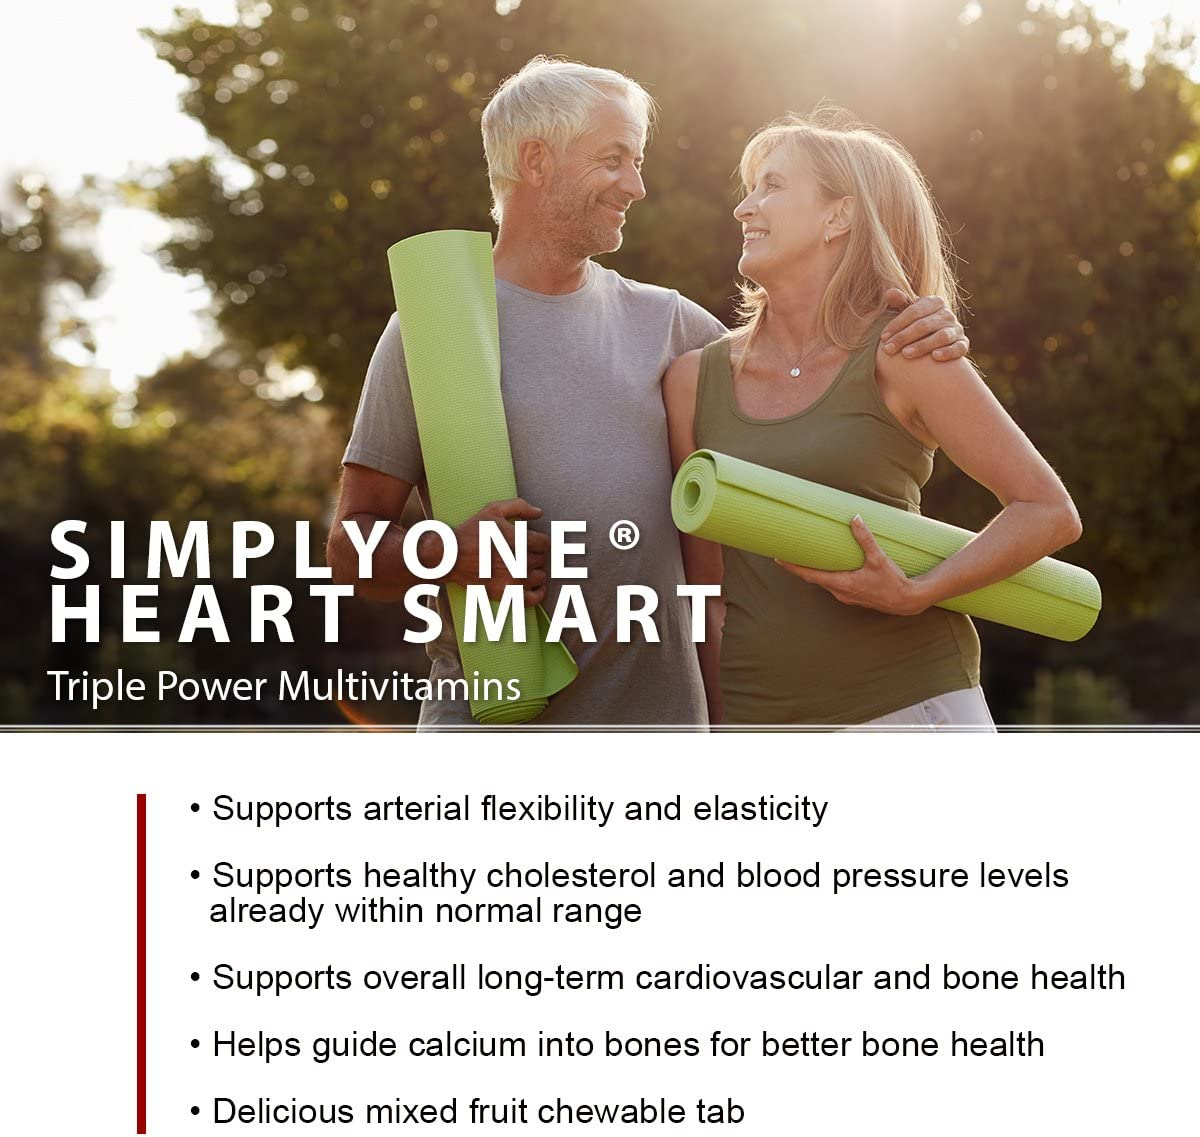 SuperNutrition SimplyOne Heart Smart, 60 Count